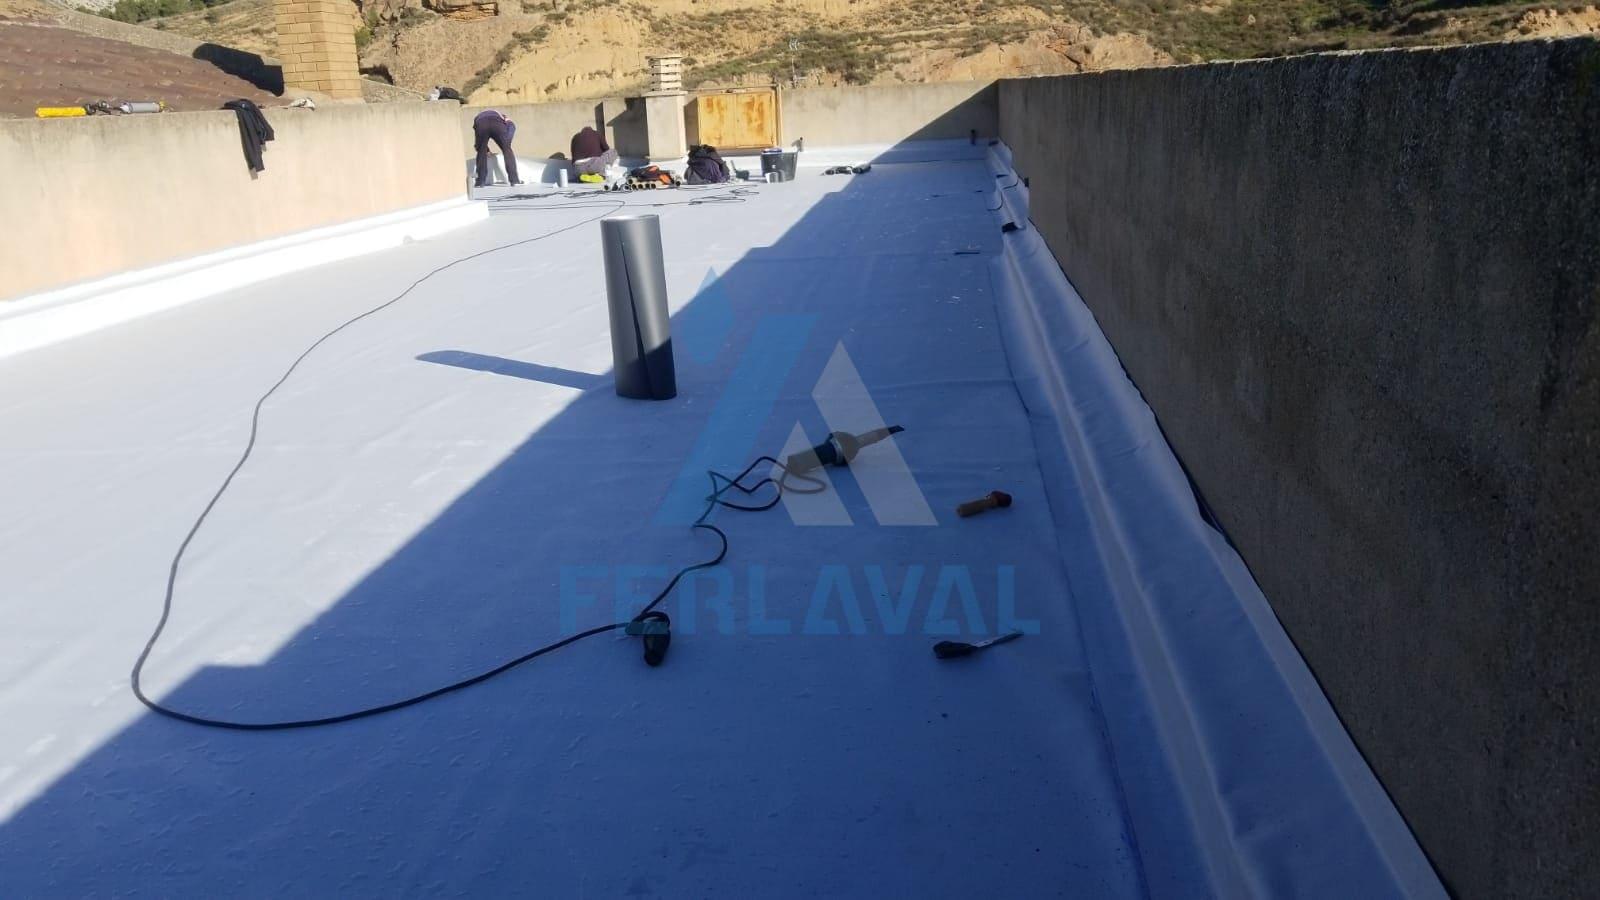 Impermeabilización + losa filtrante. Imperemeabilizando con lámina de PVC.